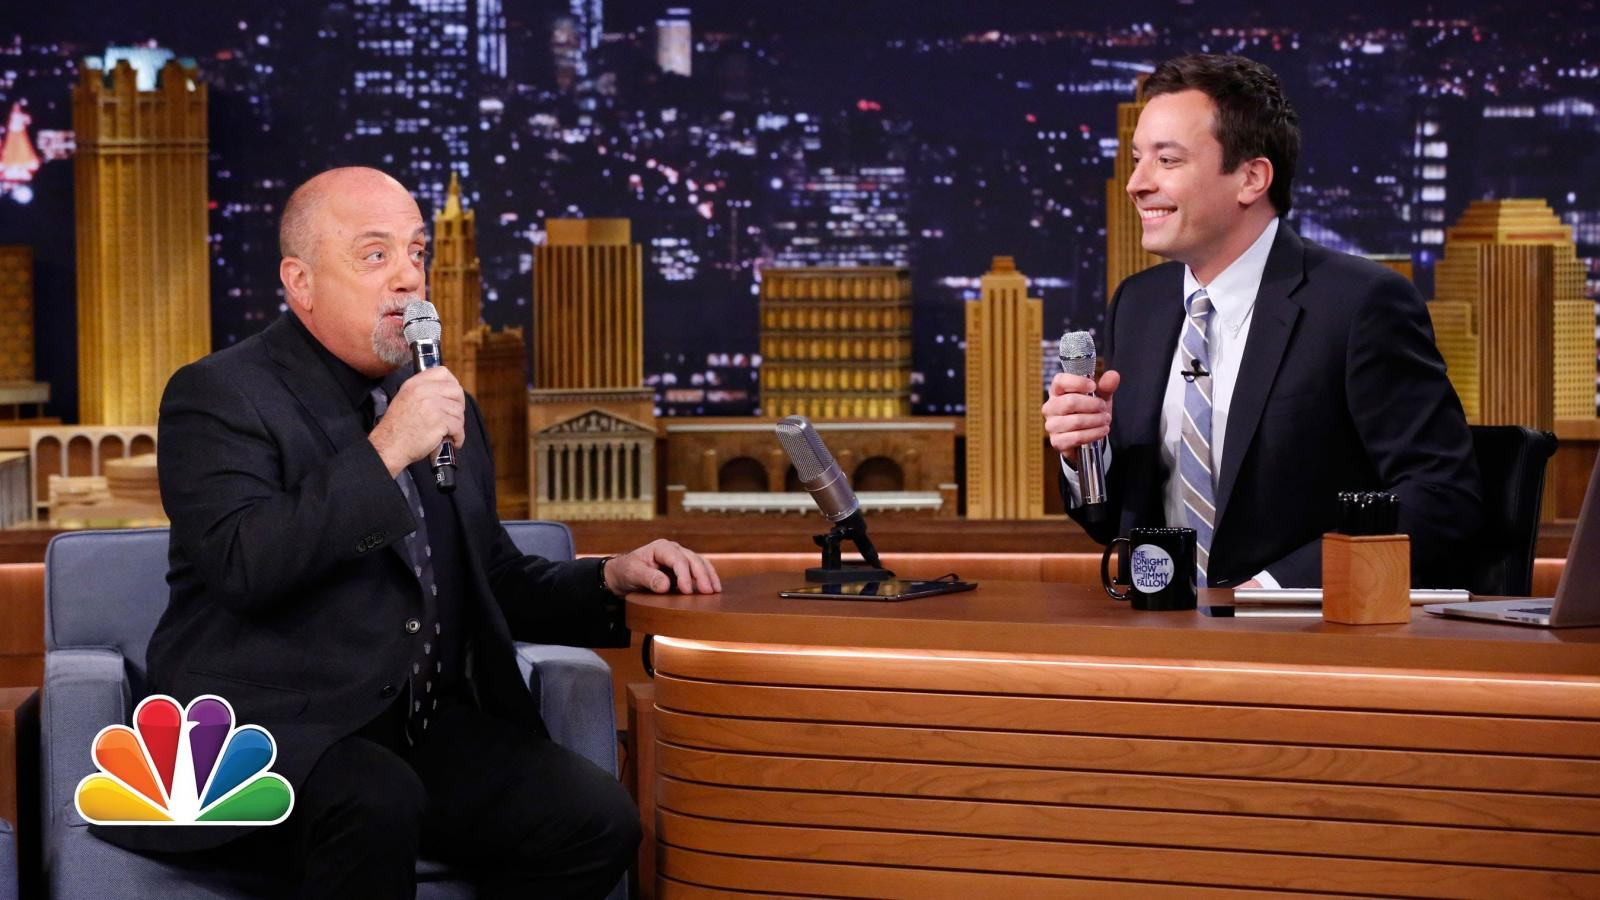 Billy Joel and Jimmy Fallon Form 2-Man Doo-Wop Group Using iPad